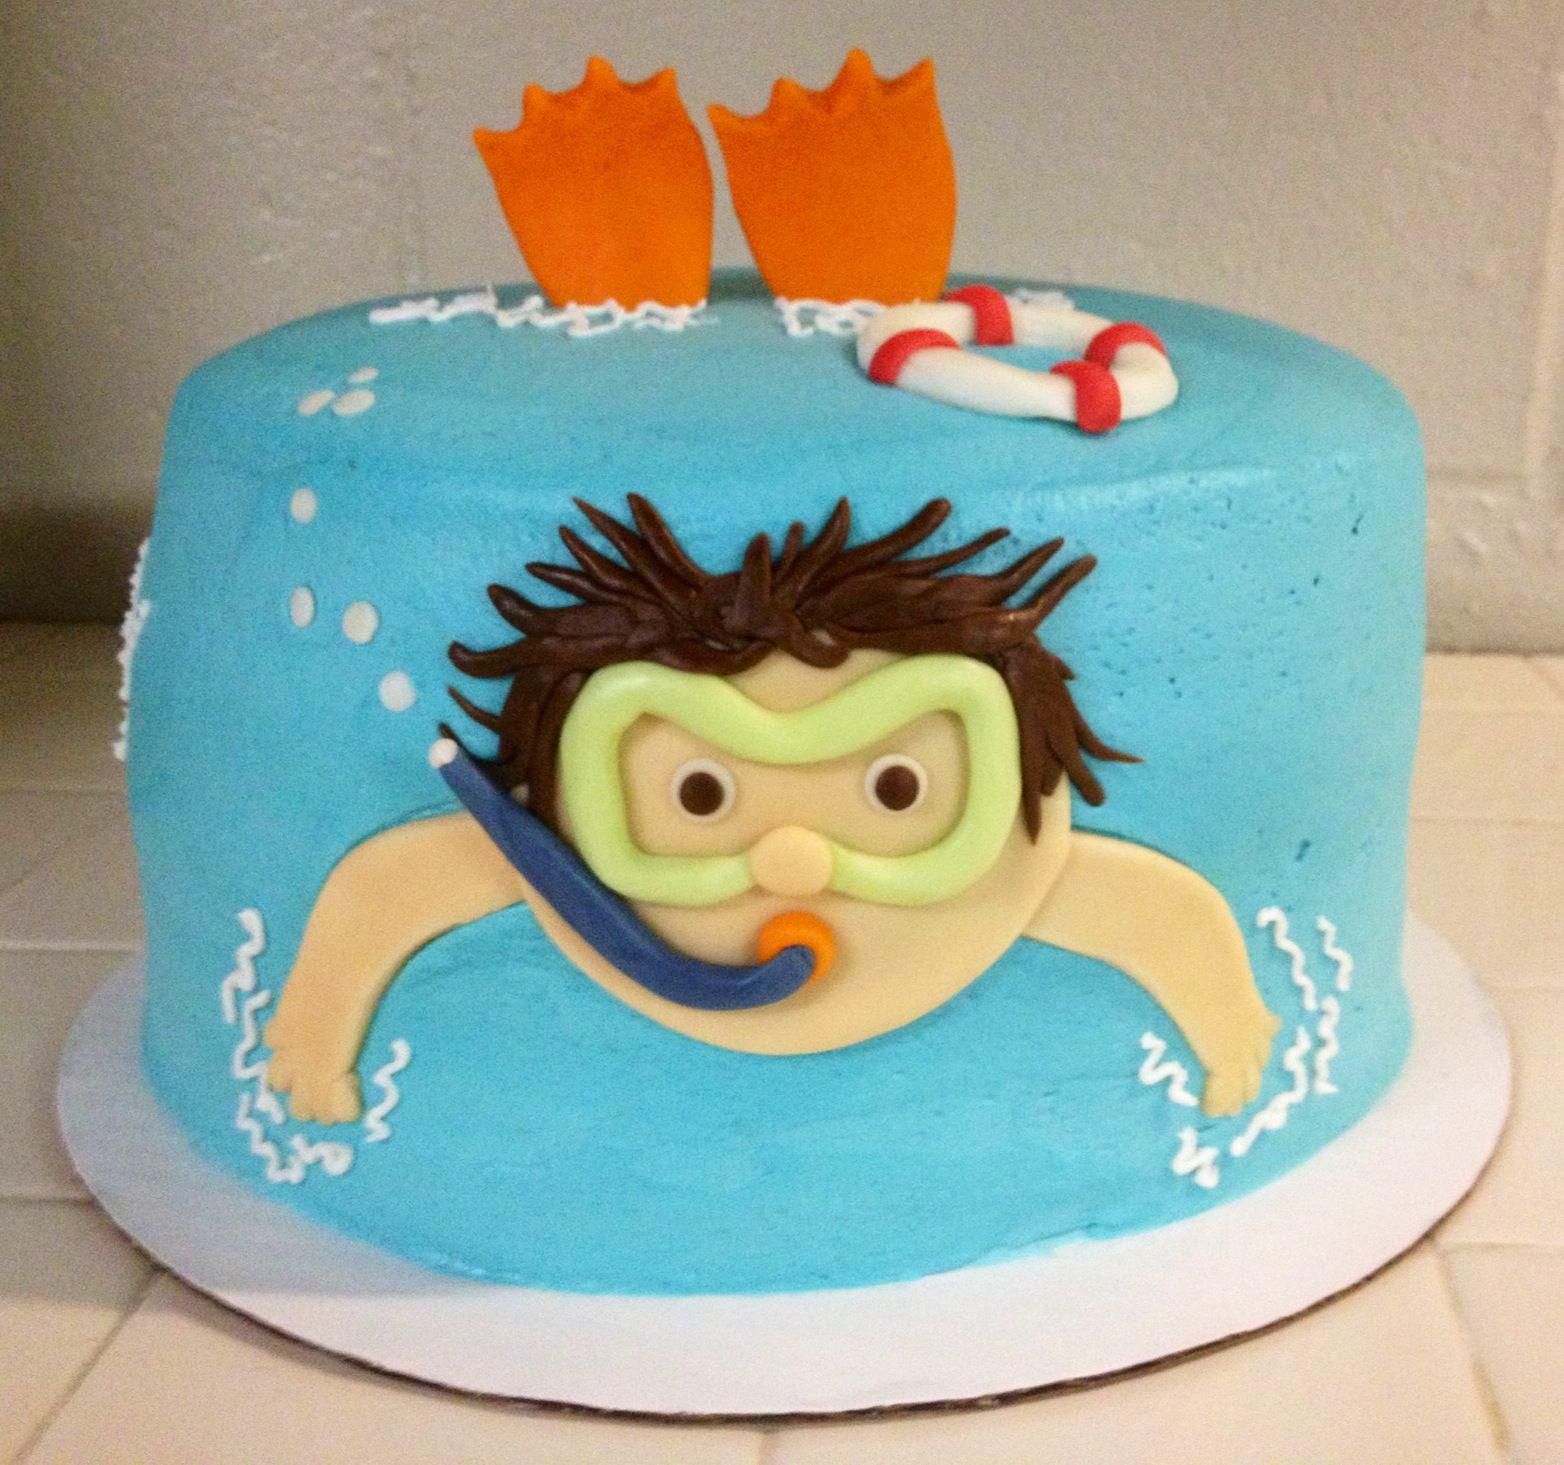 Pool party birthday cake Cake ideas Pinterest ...